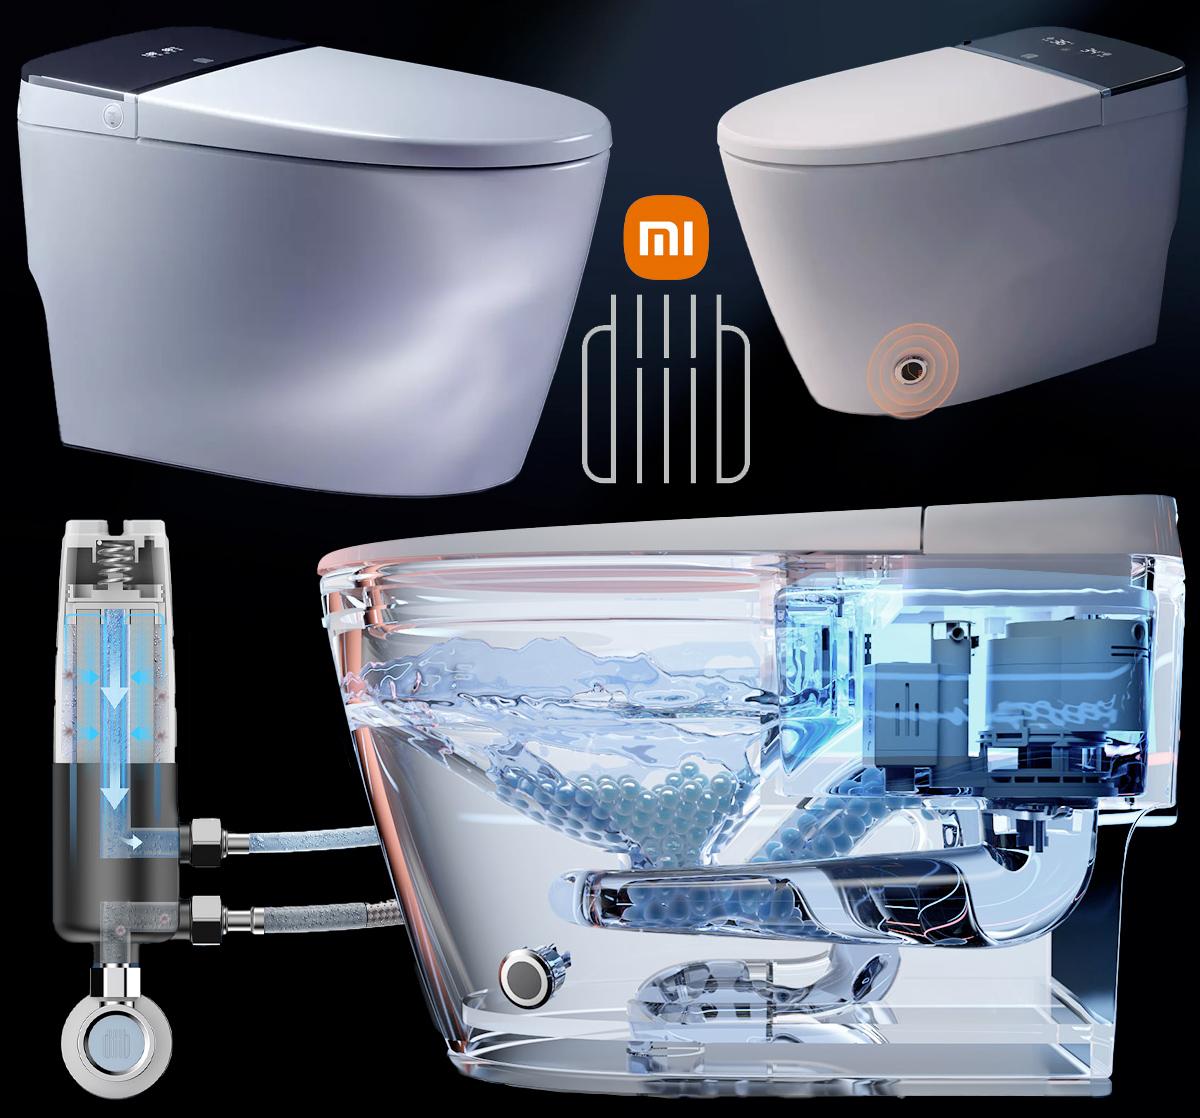 Privada Inteligente Xiaomi DIIIB Supercharged Smart Toilet